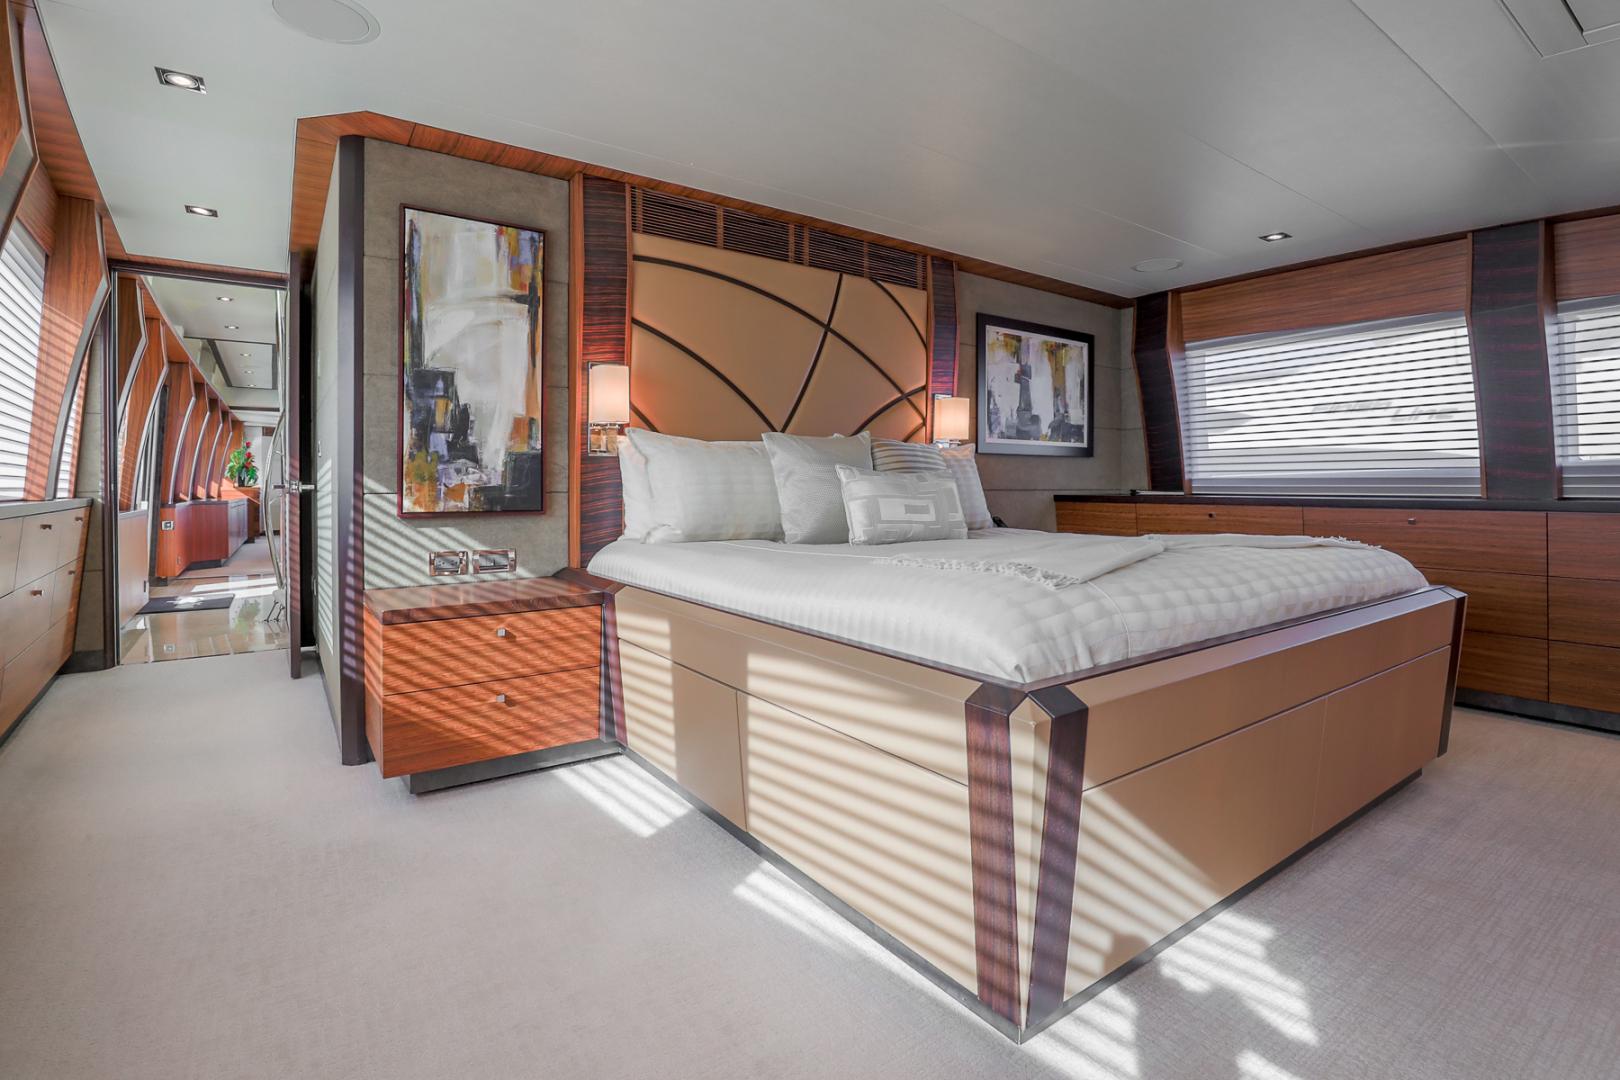 Northcoast-NC125 2011-FUGITIVE *Name Reserved* West Palm Beach-Florida-United States-Master Stateroom-1513454 | Thumbnail